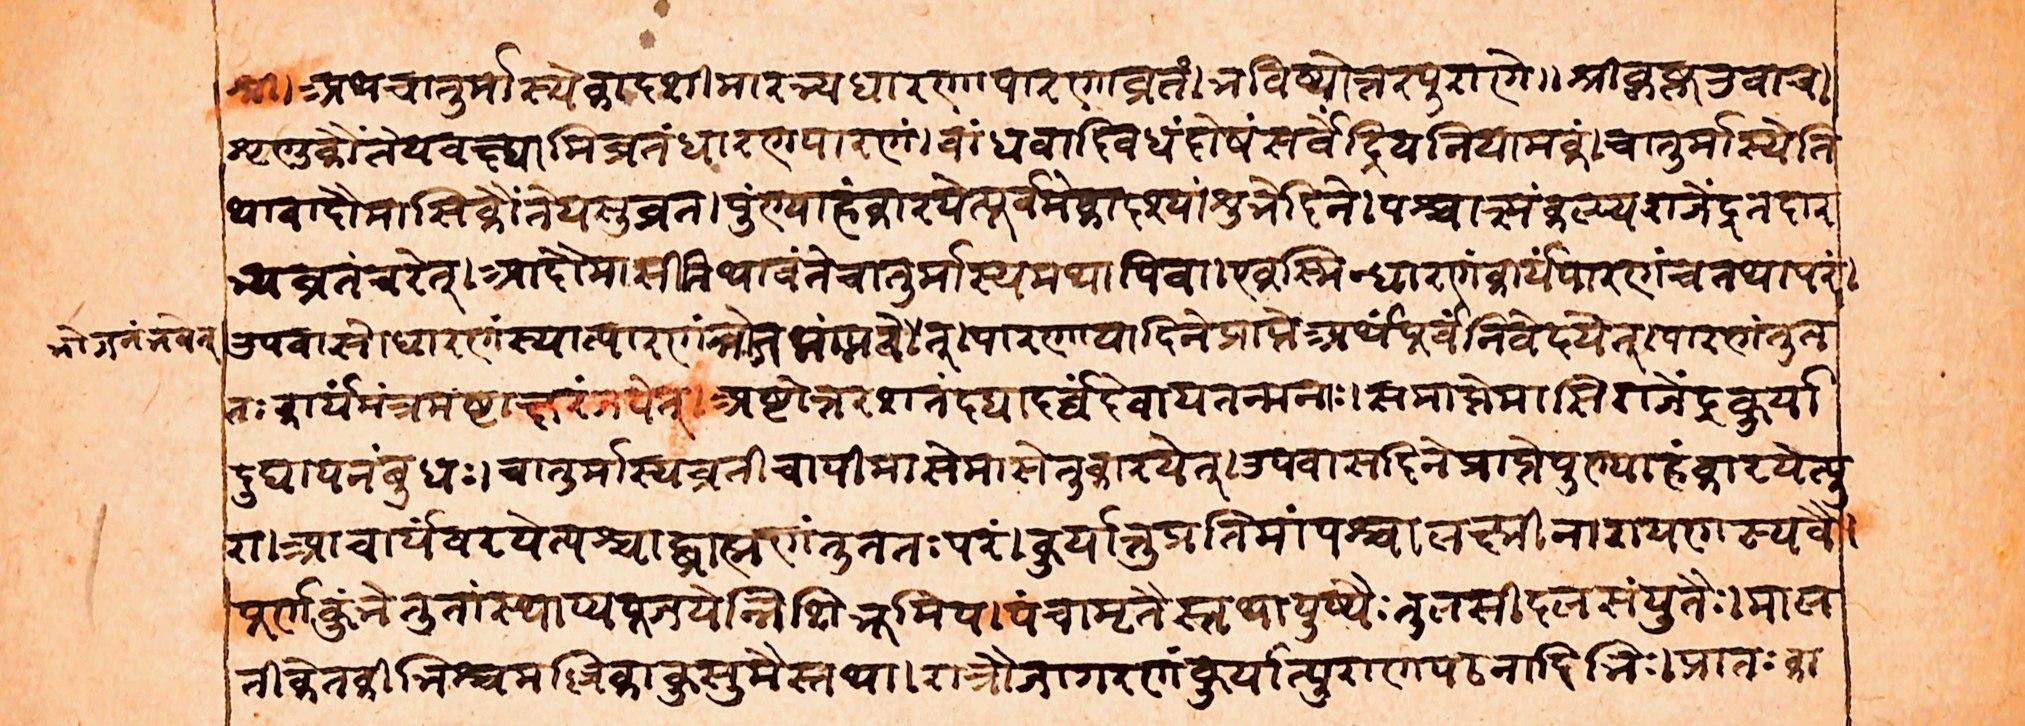 Bhavishya Purana - The complete information and online sale